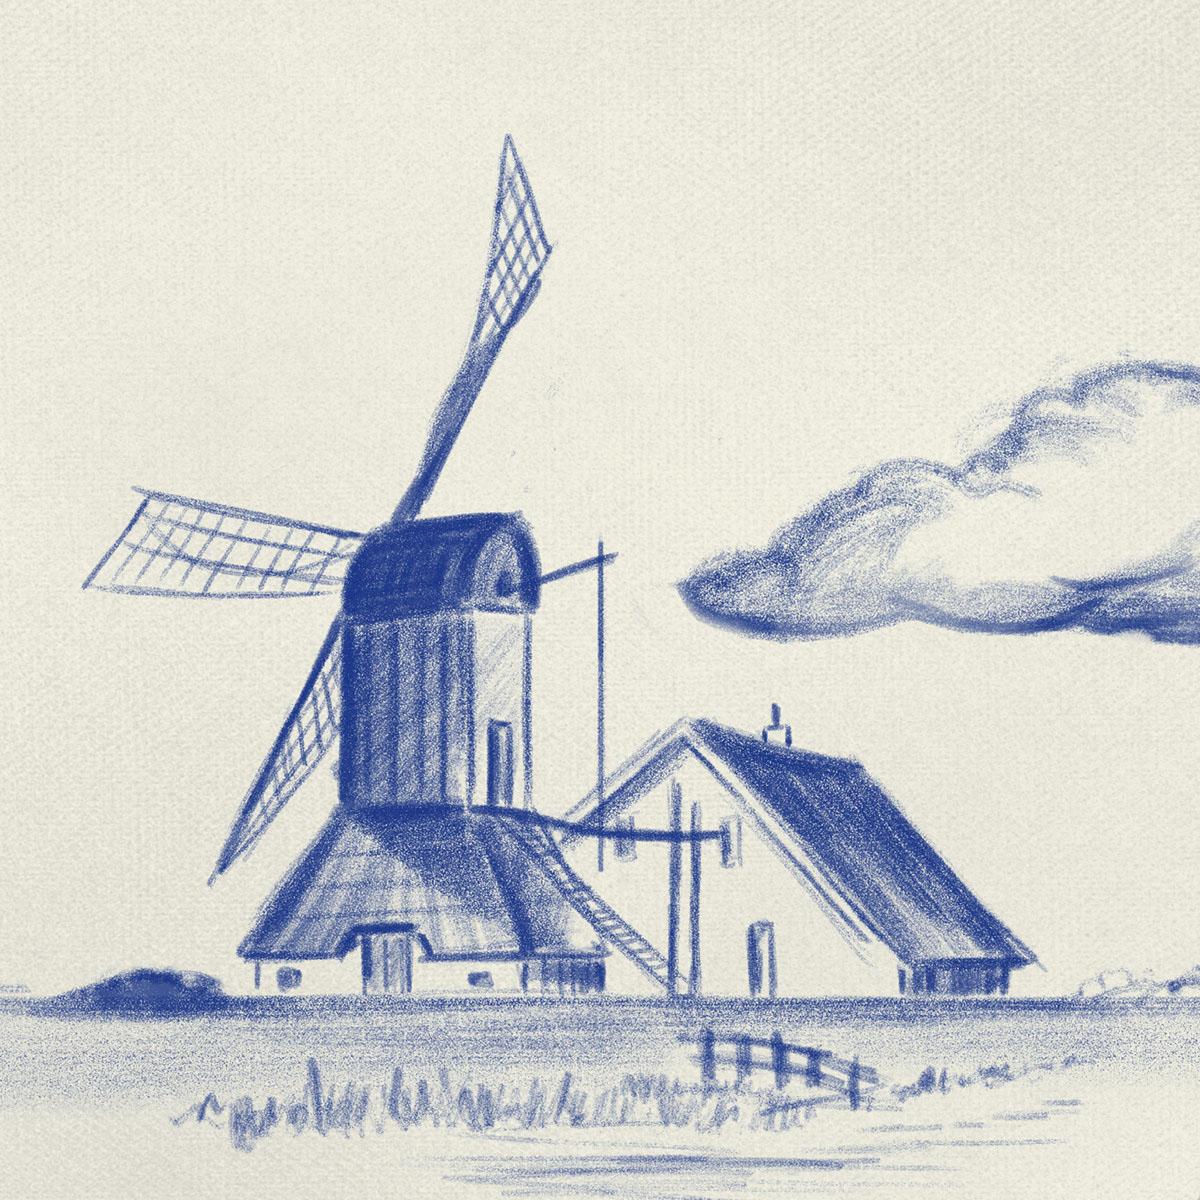 Modern Times delftware delft Delftsblauw tile windmill